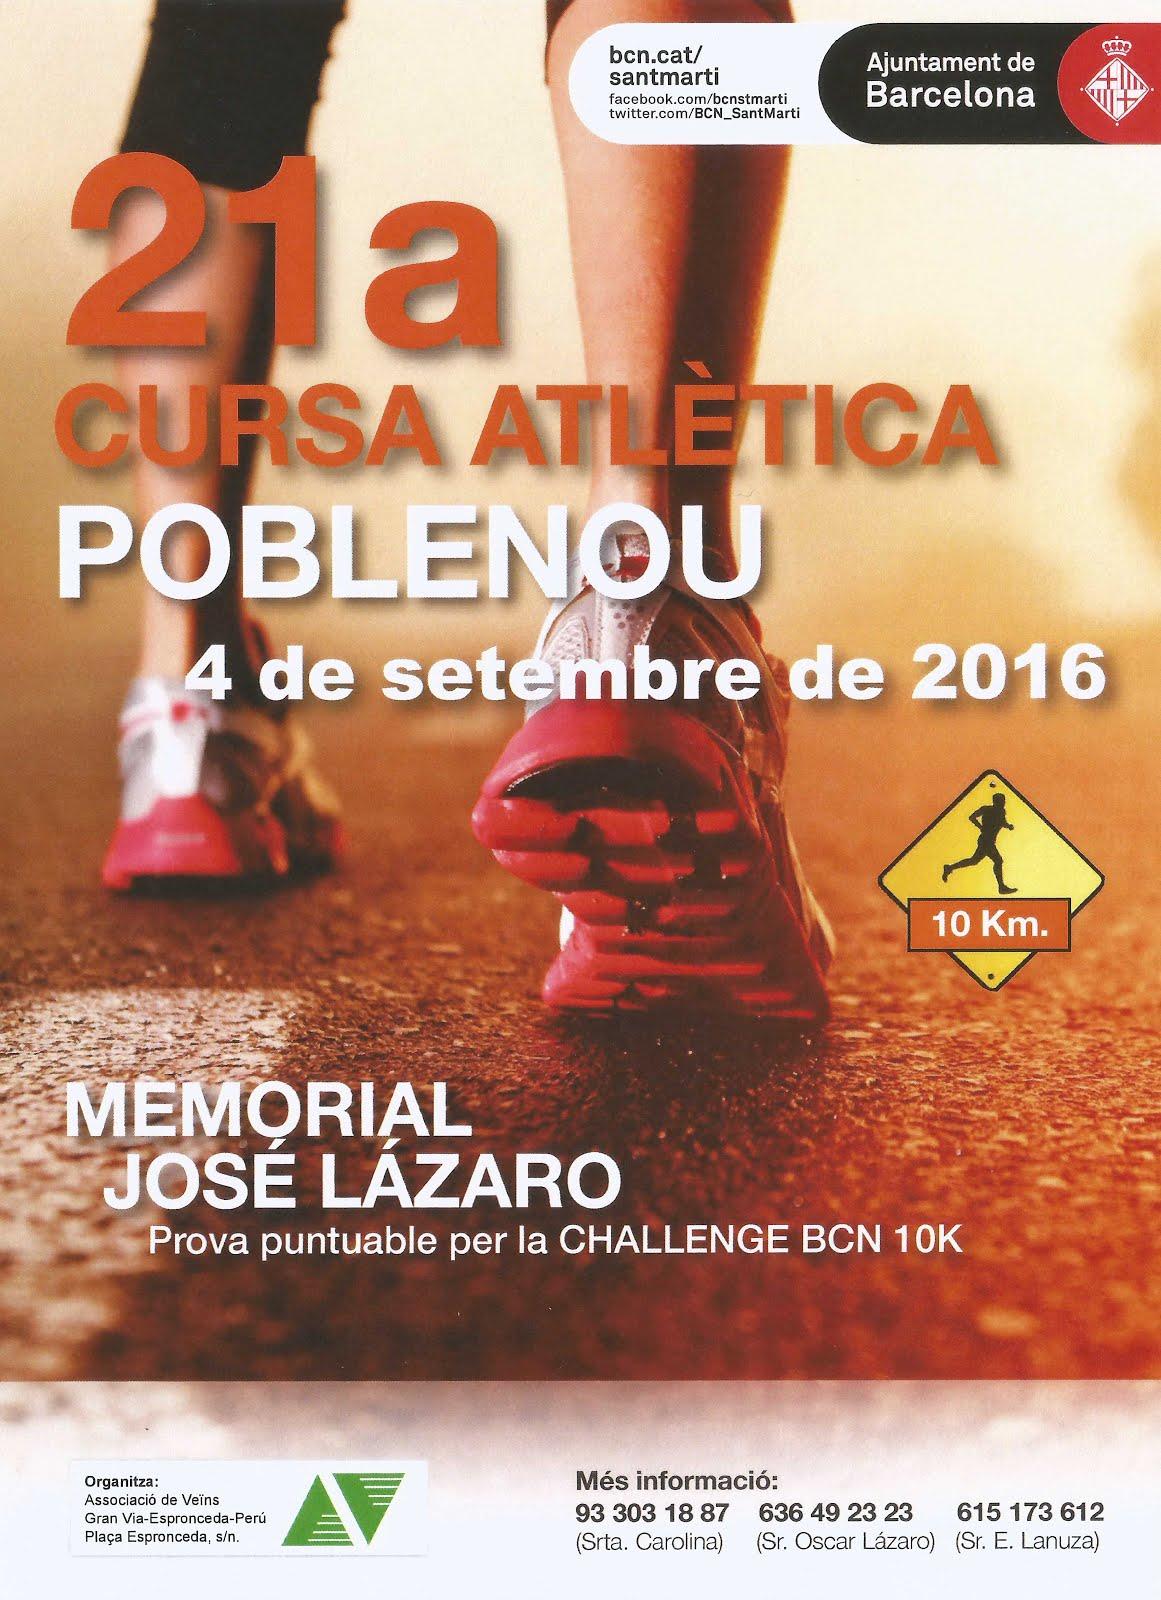 Cursa Atlética Poble Nou'16 (04/09/16)